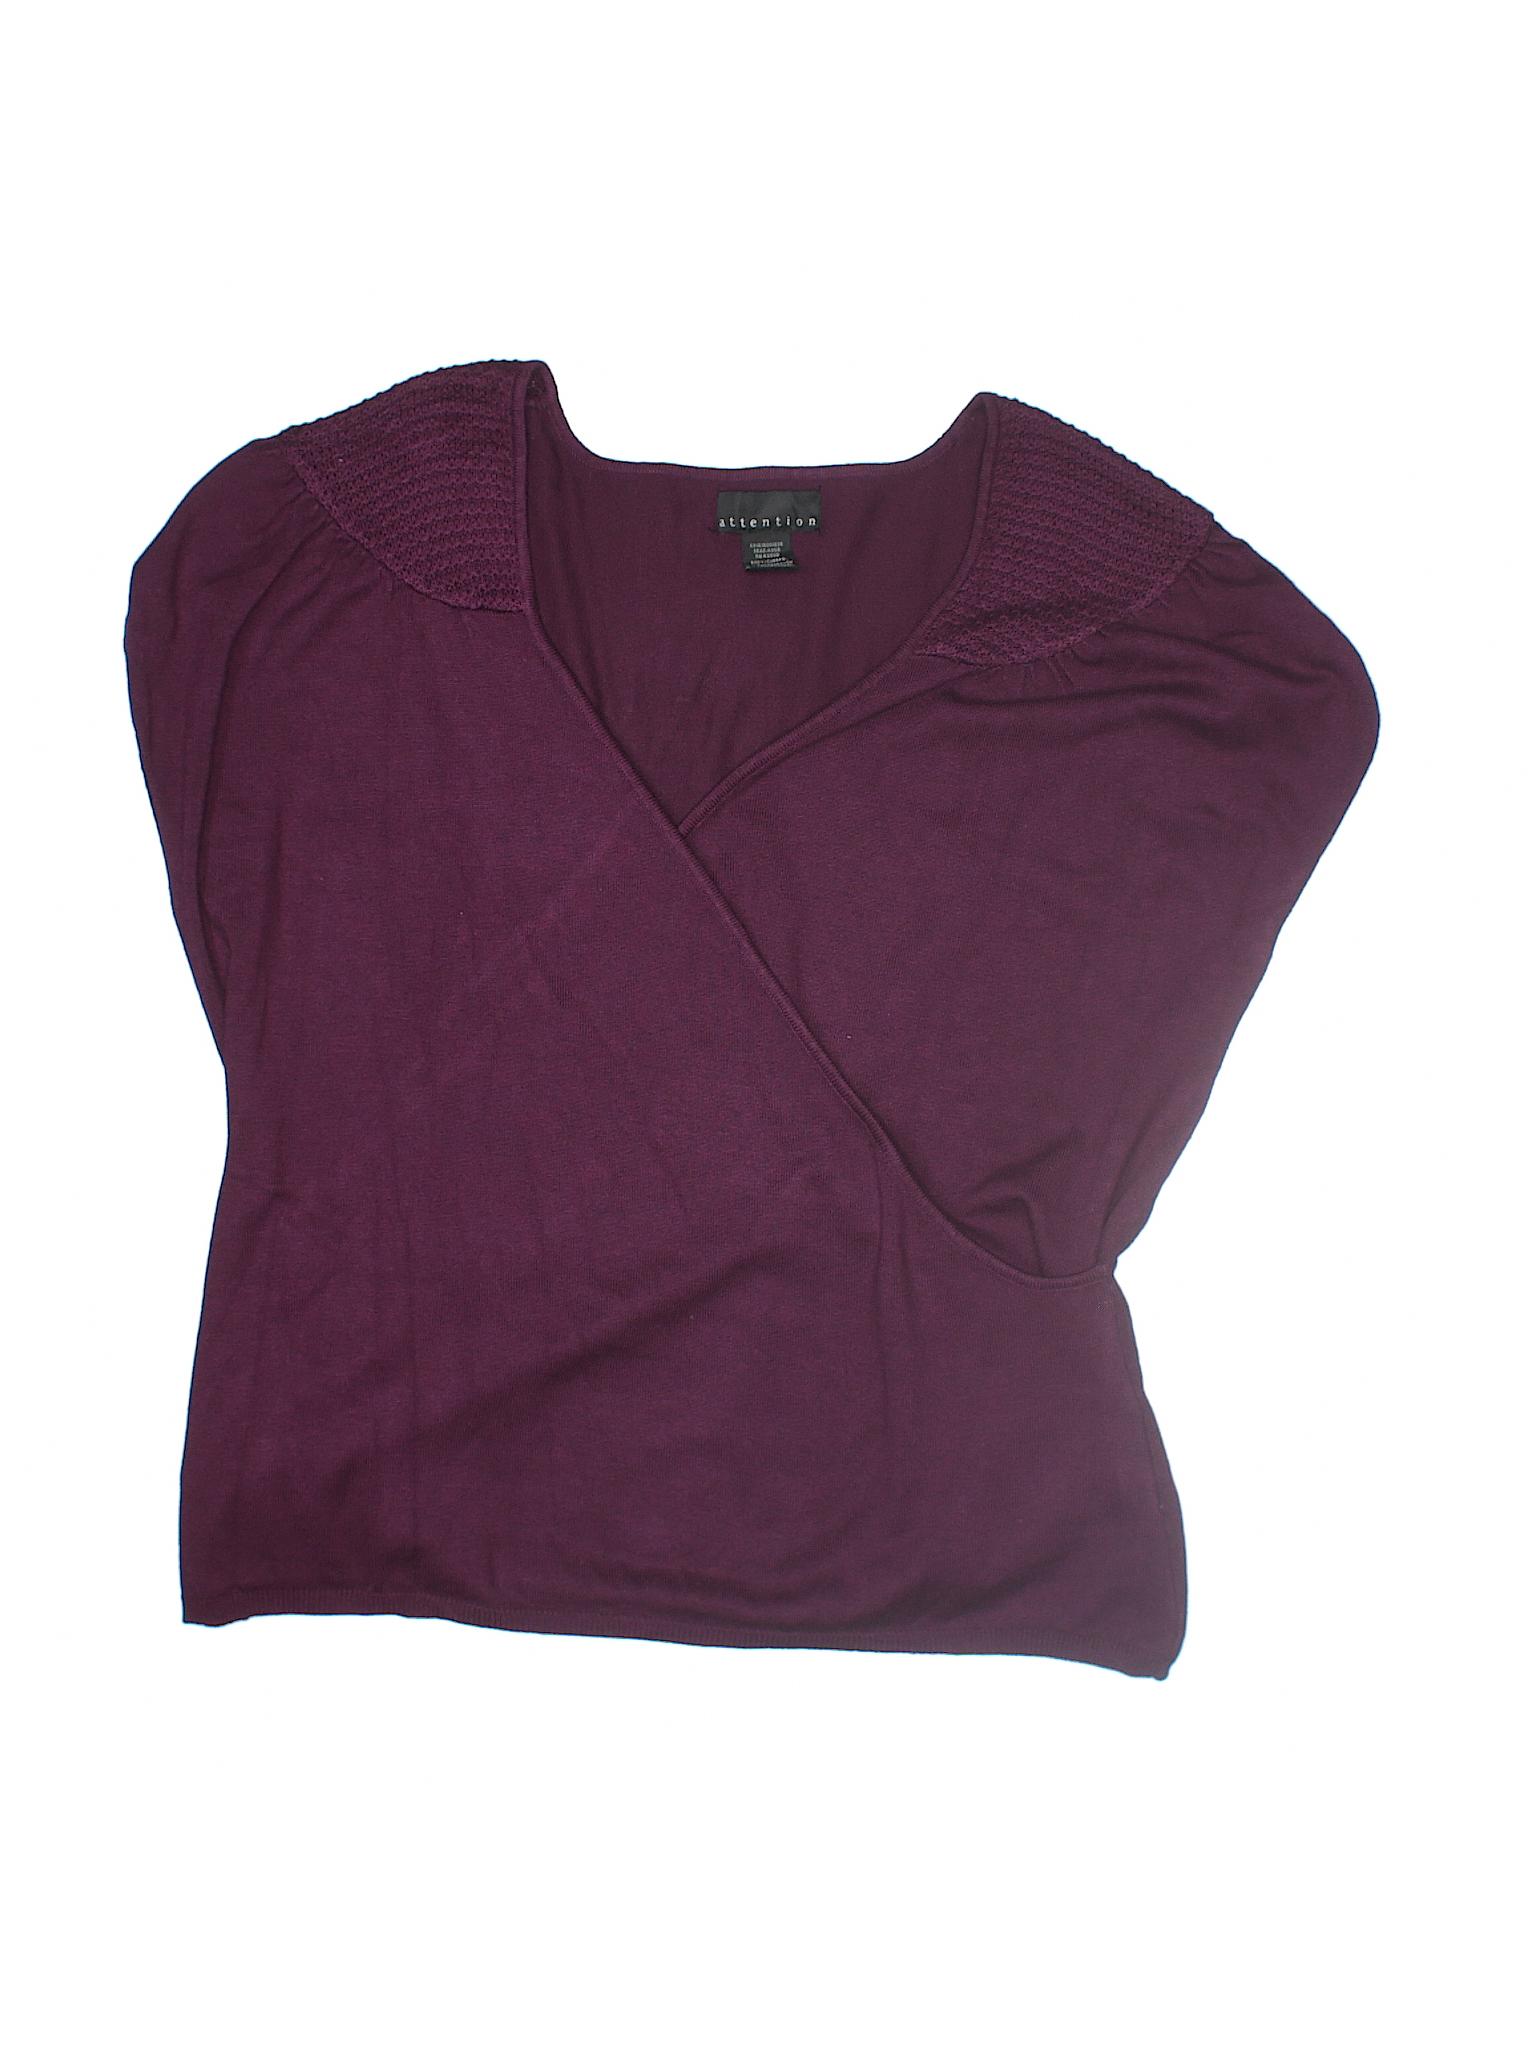 Boutique Boutique Sweater Pullover winter Attention winter 0SqrSwx5